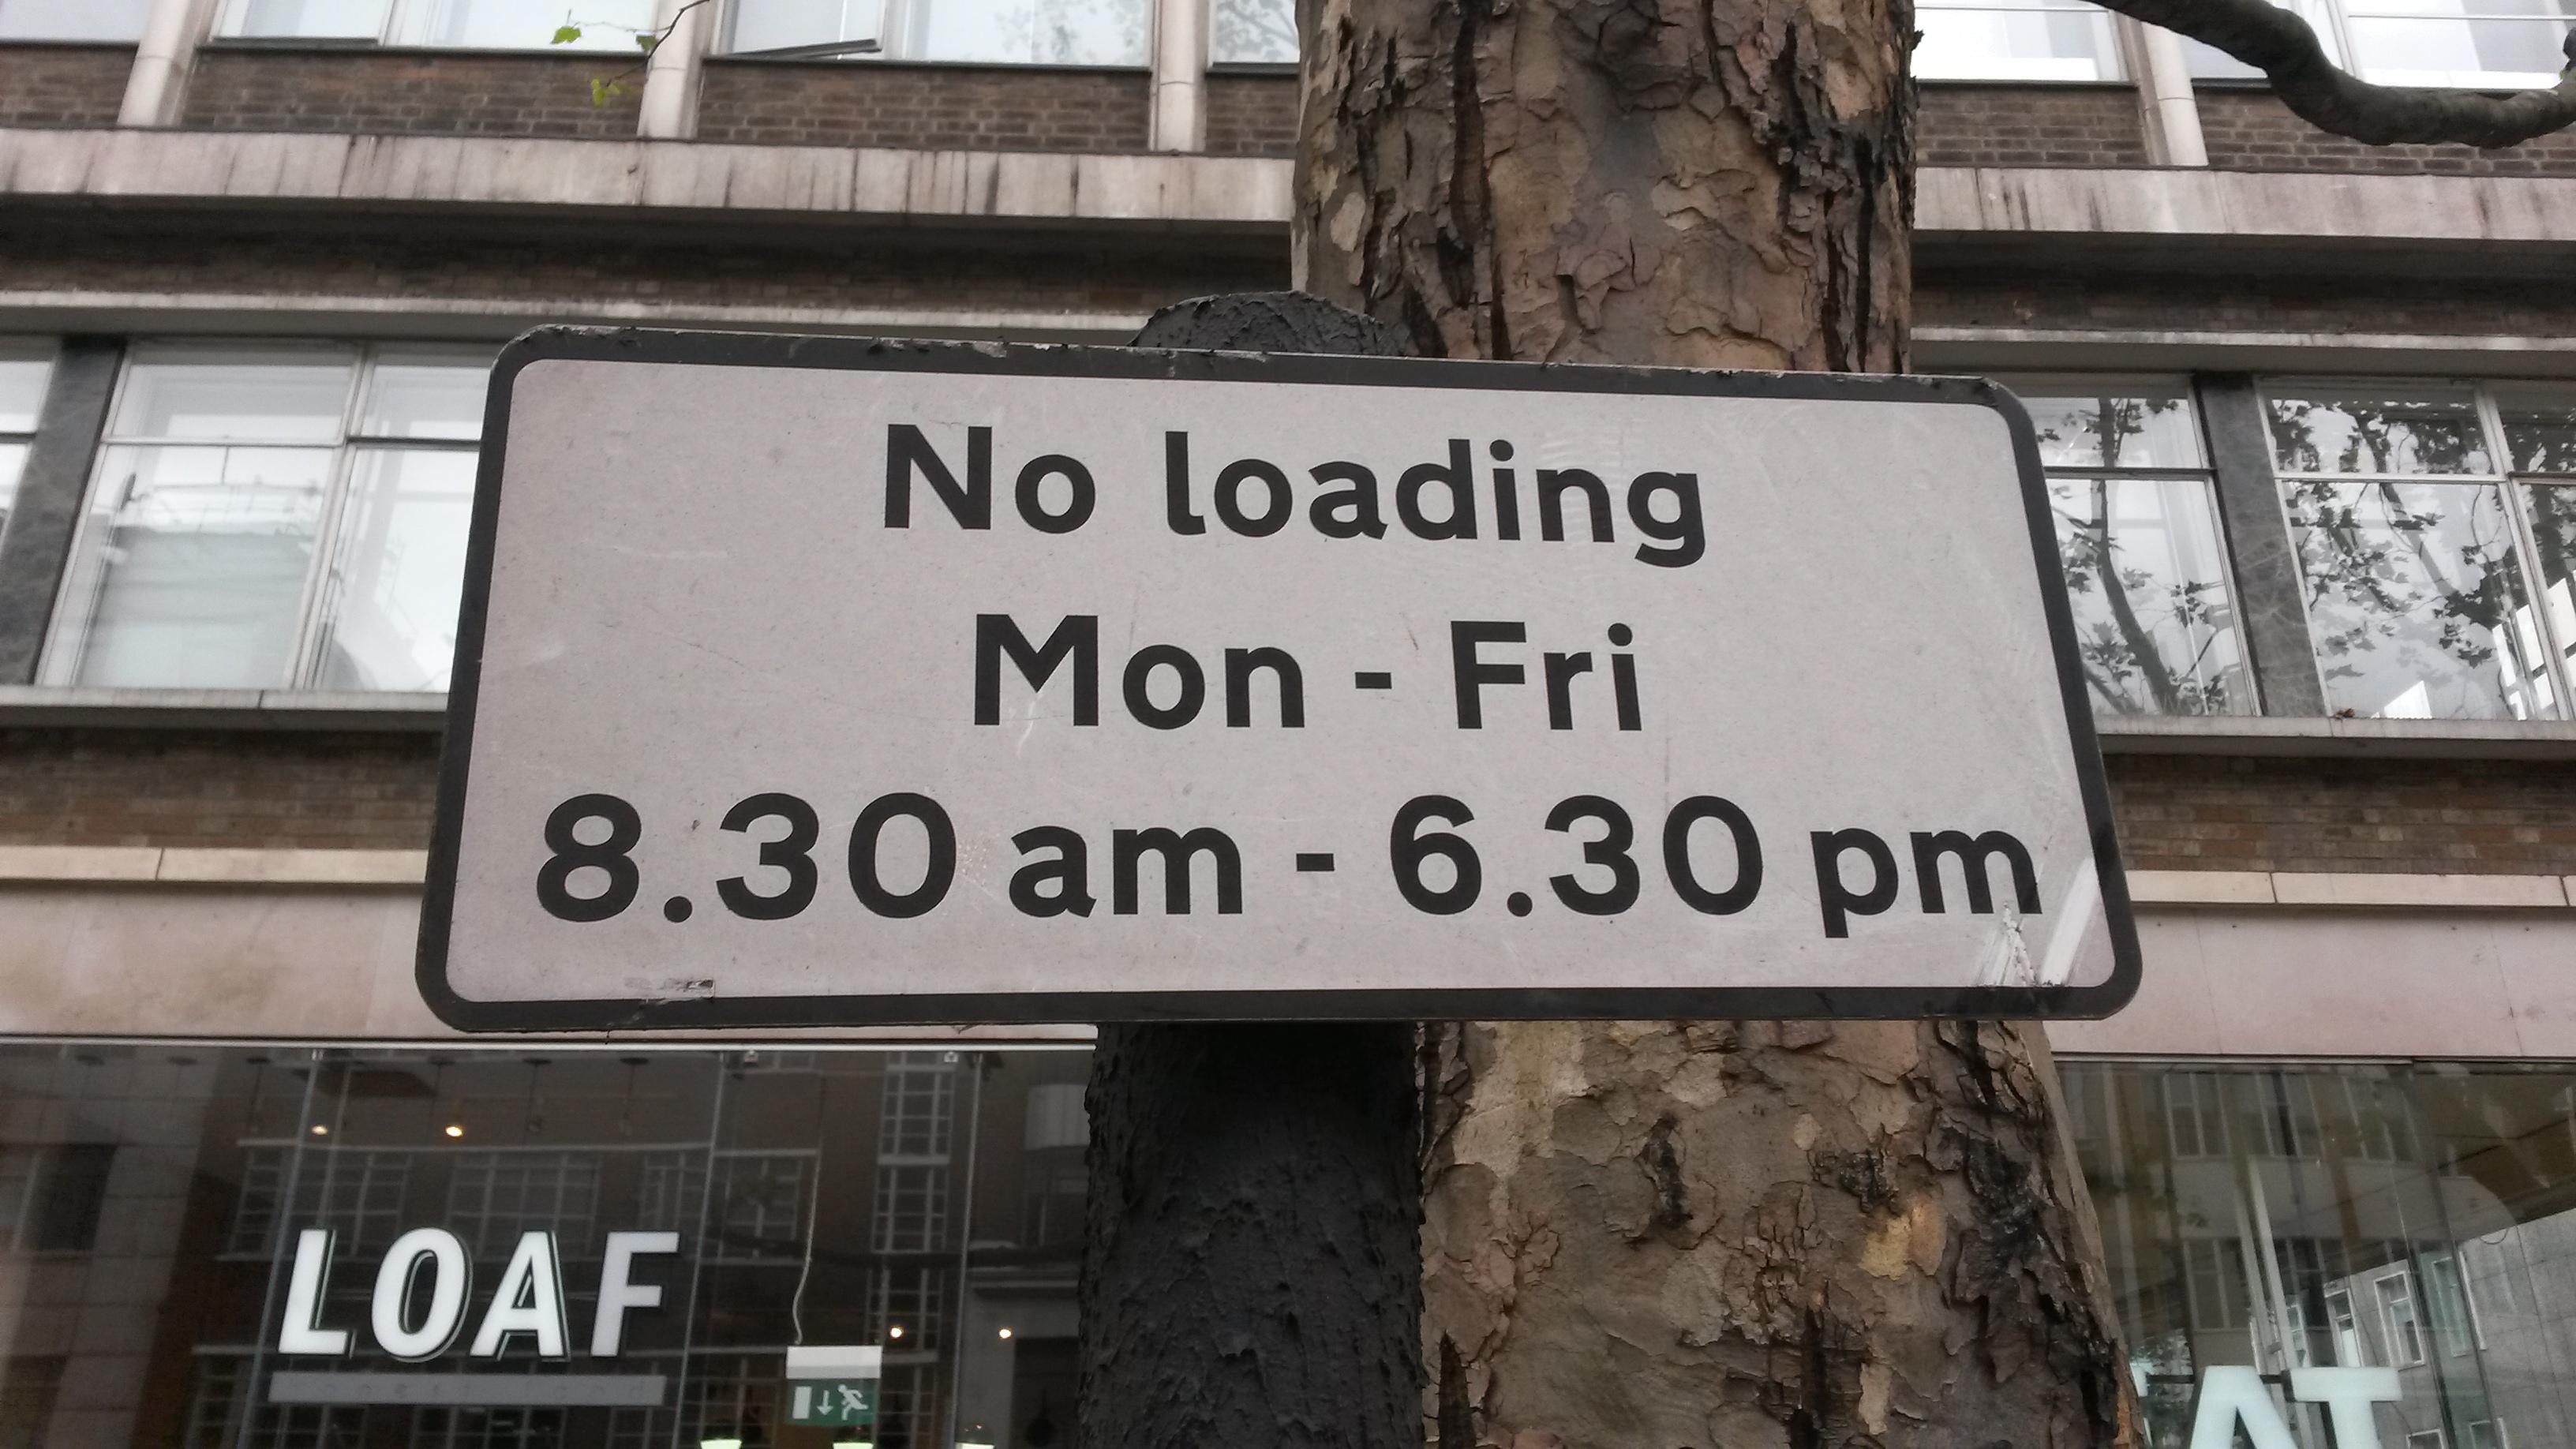 """No loading Mon - Fri 8.30am - 6.30pm"" says the sign."